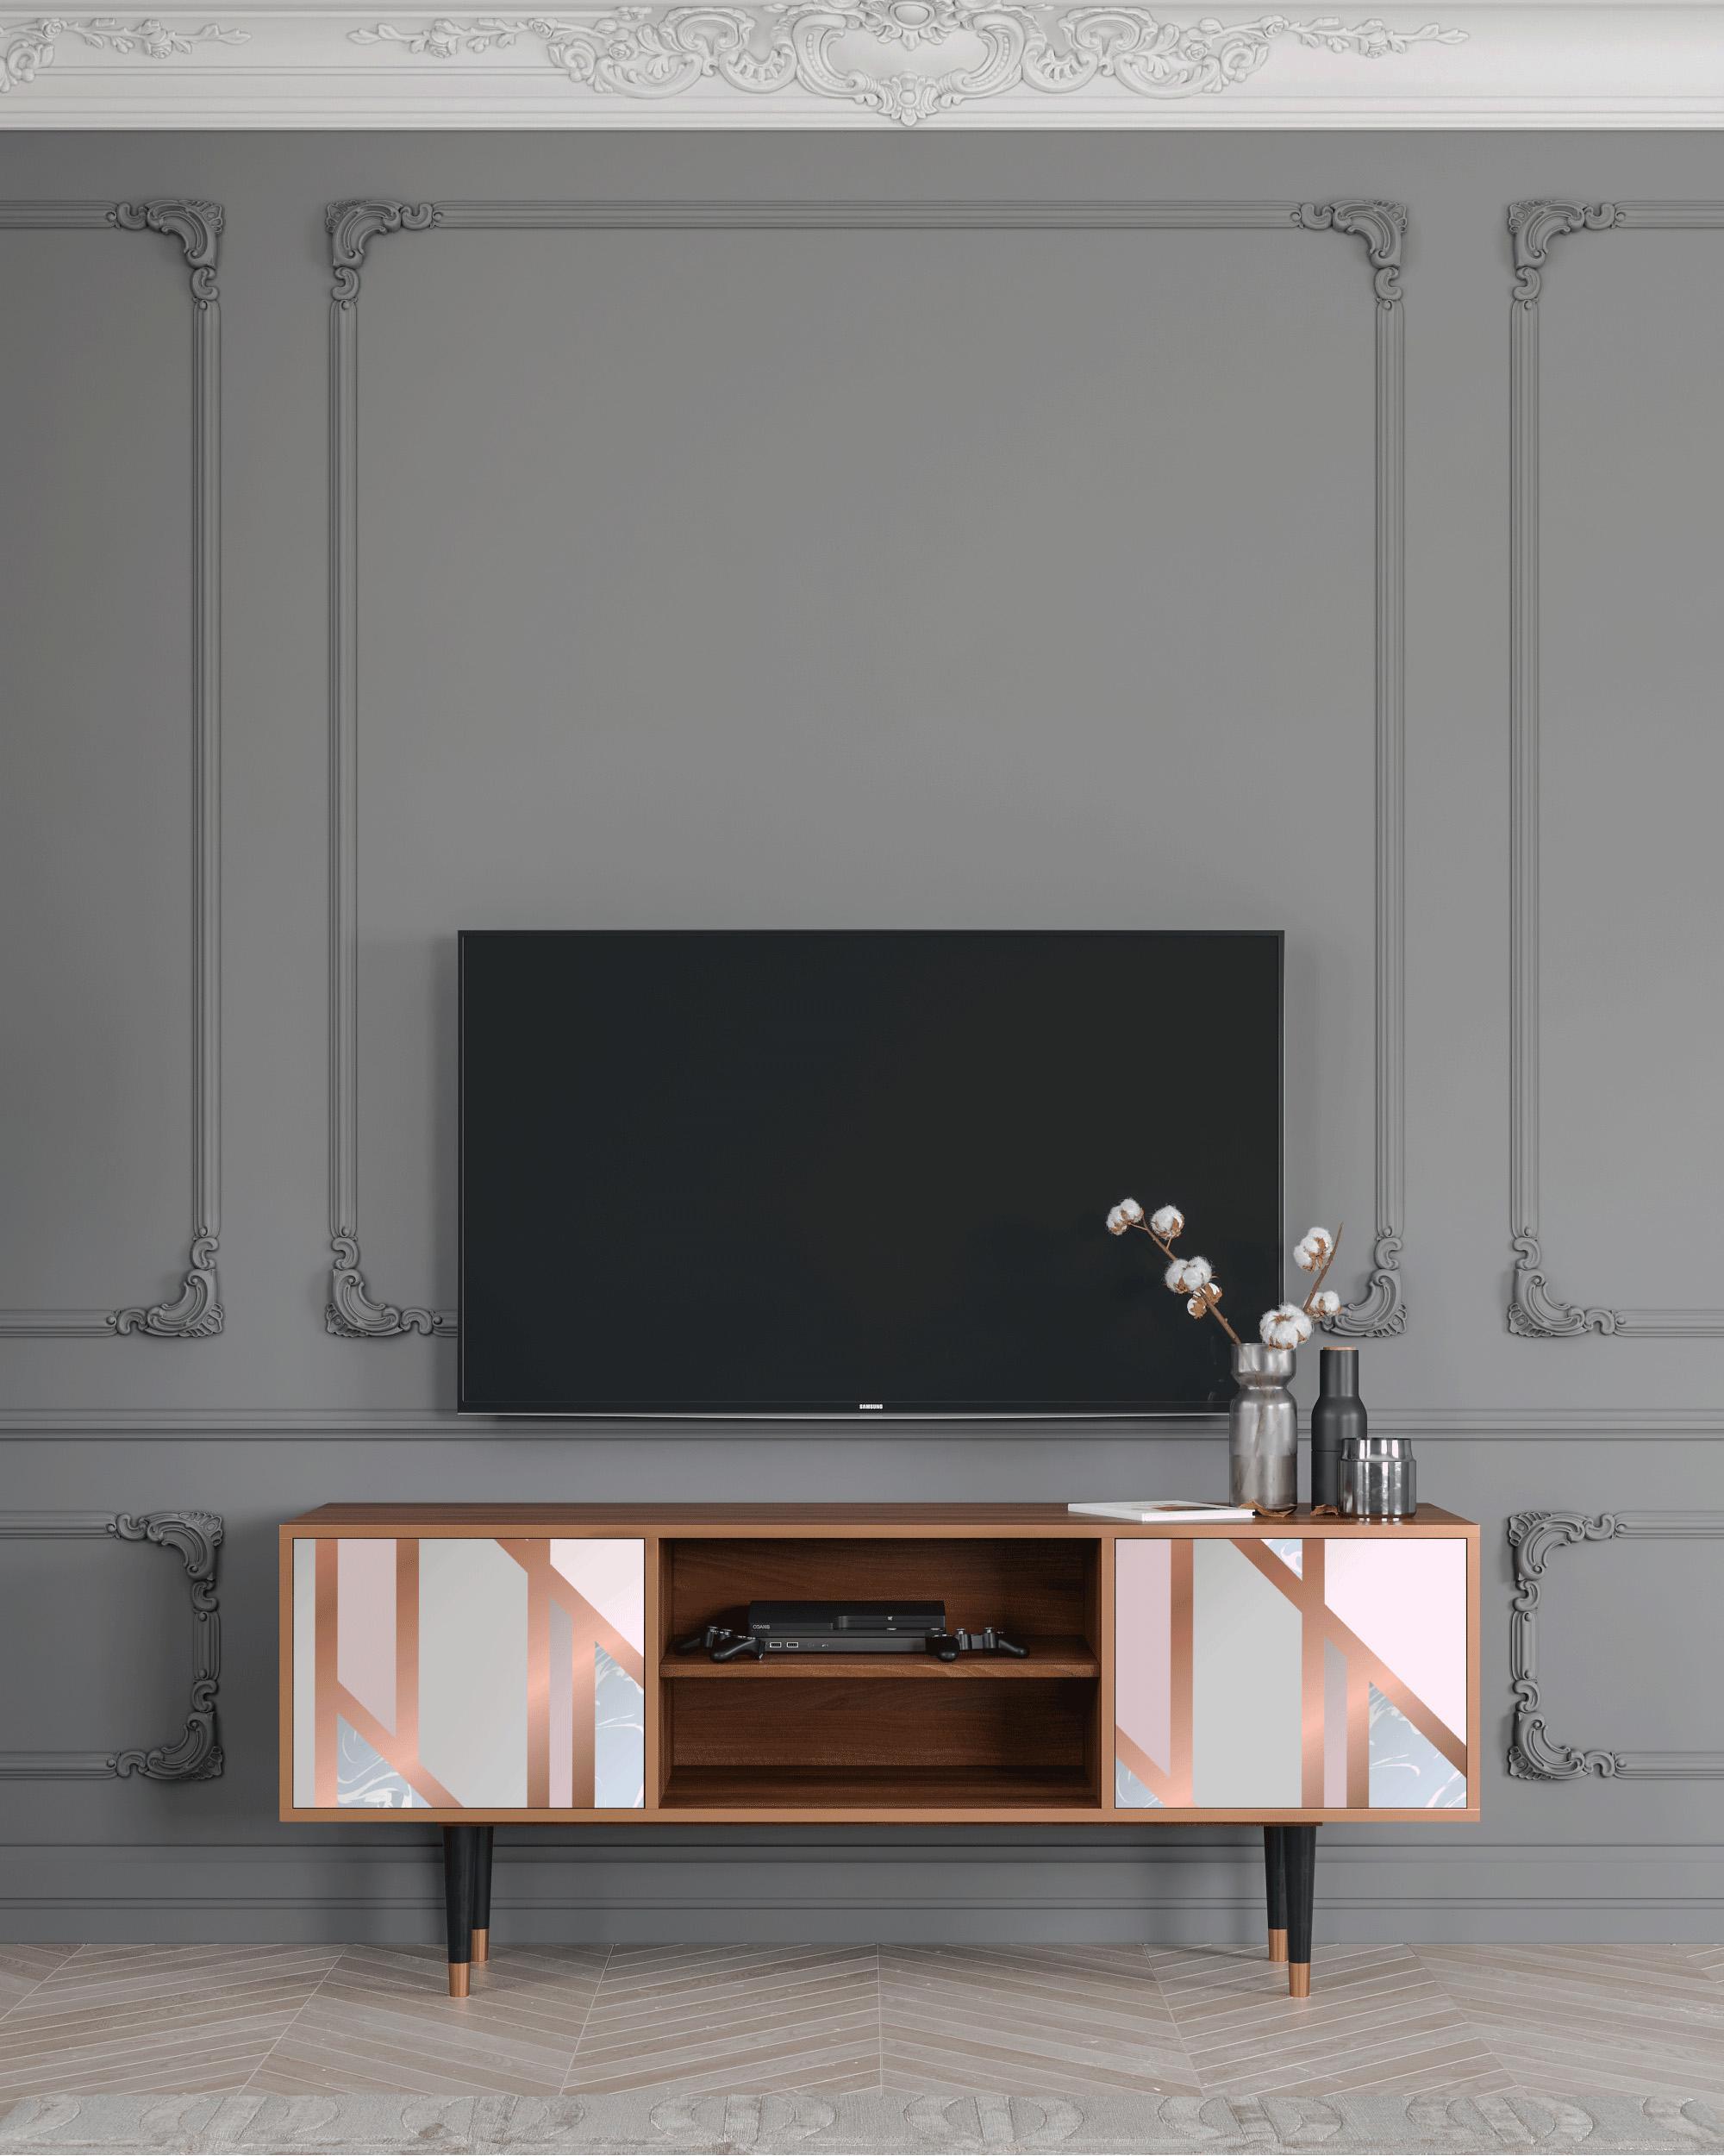 Meuble TV rose et doré 170cm 2 portes